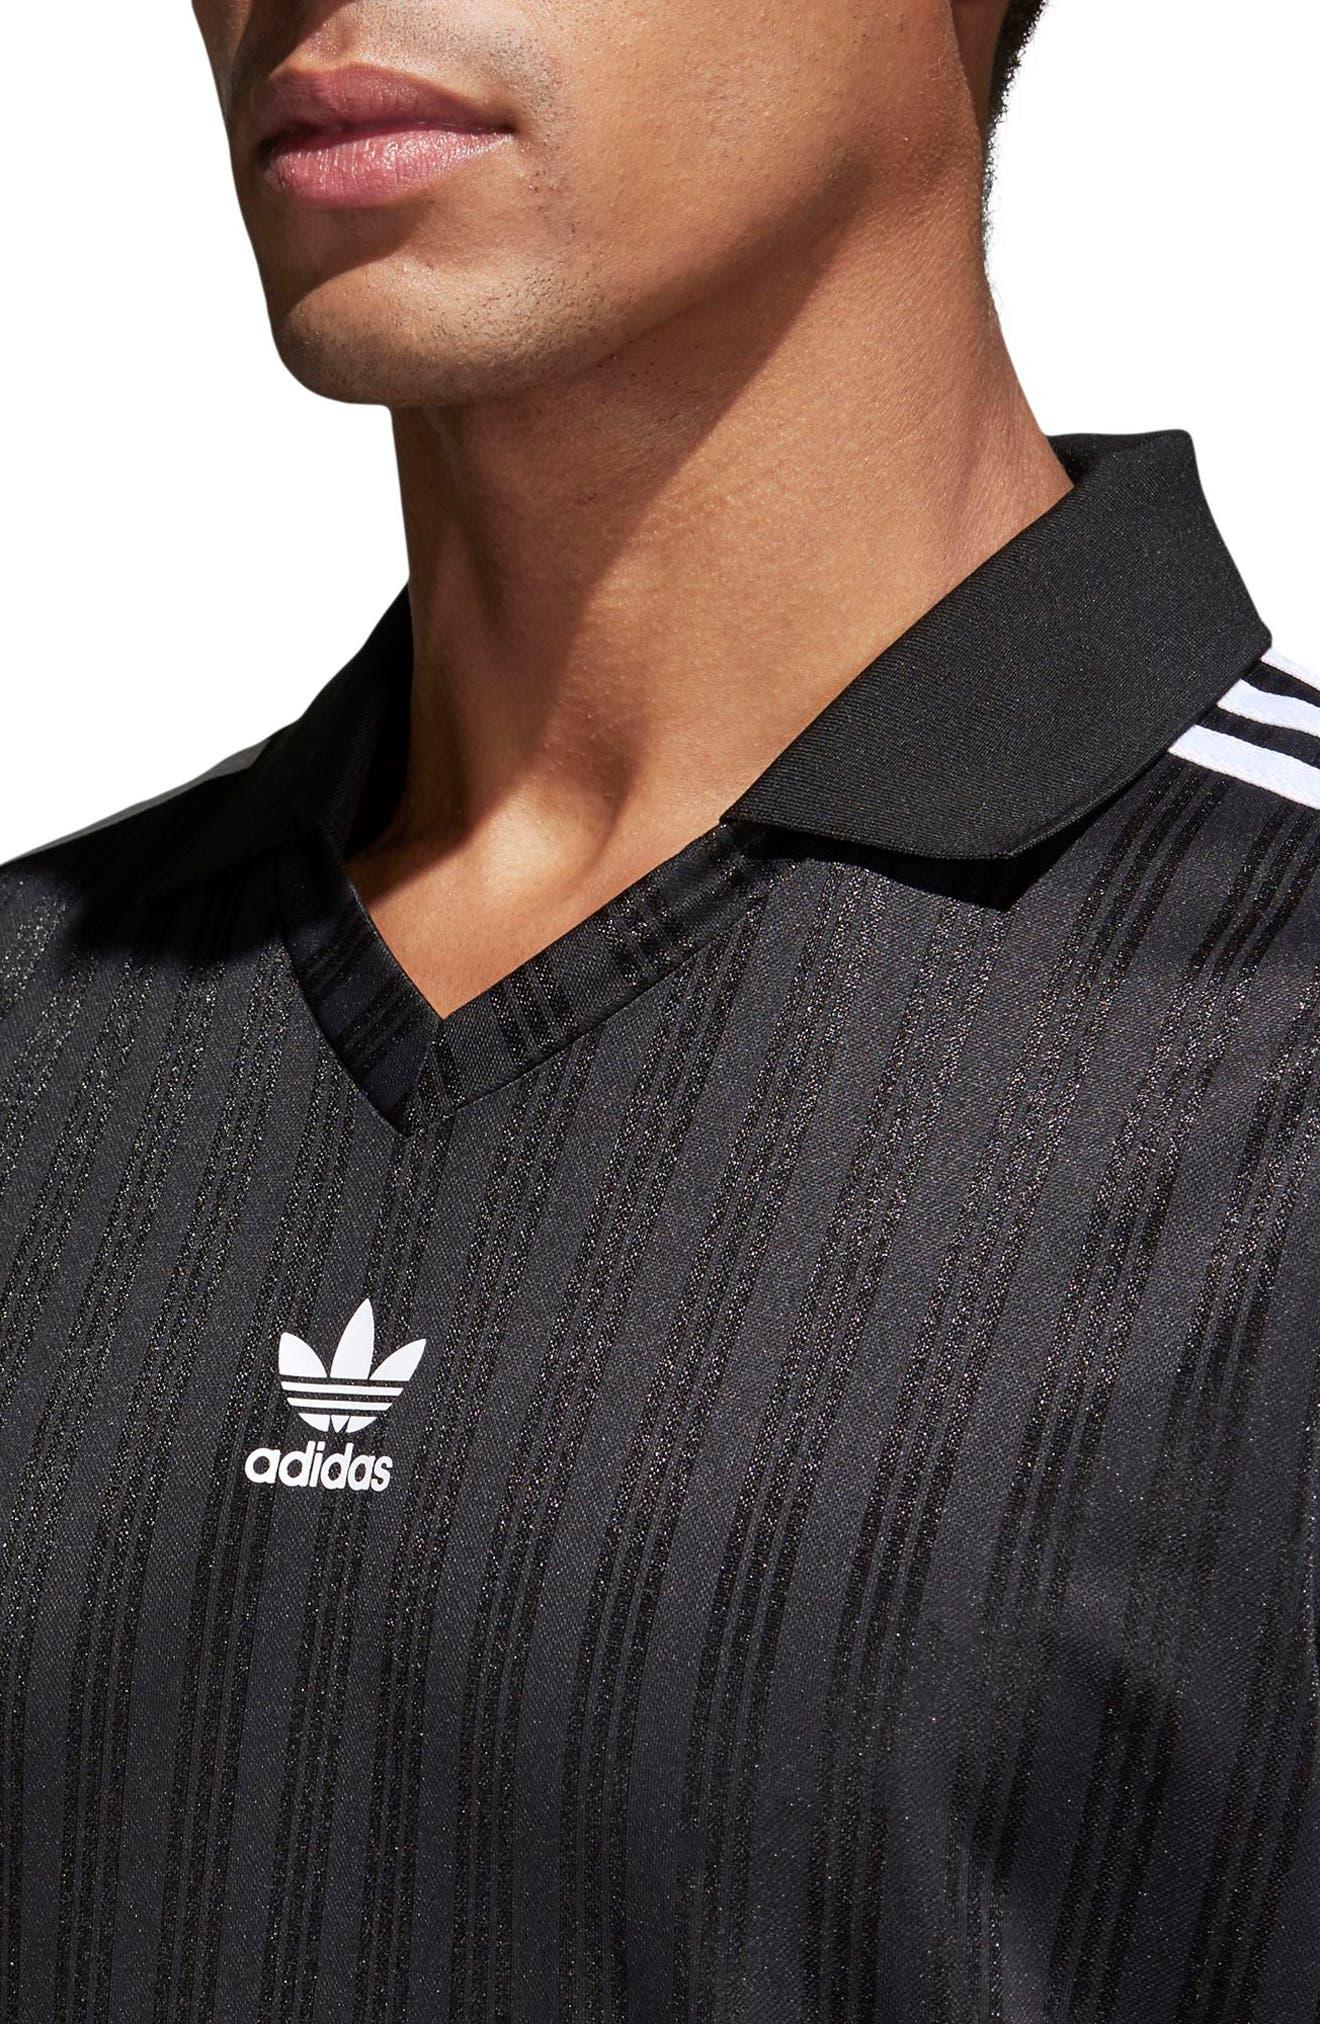 adidas Football Jersey Polo,                             Alternate thumbnail 4, color,                             001